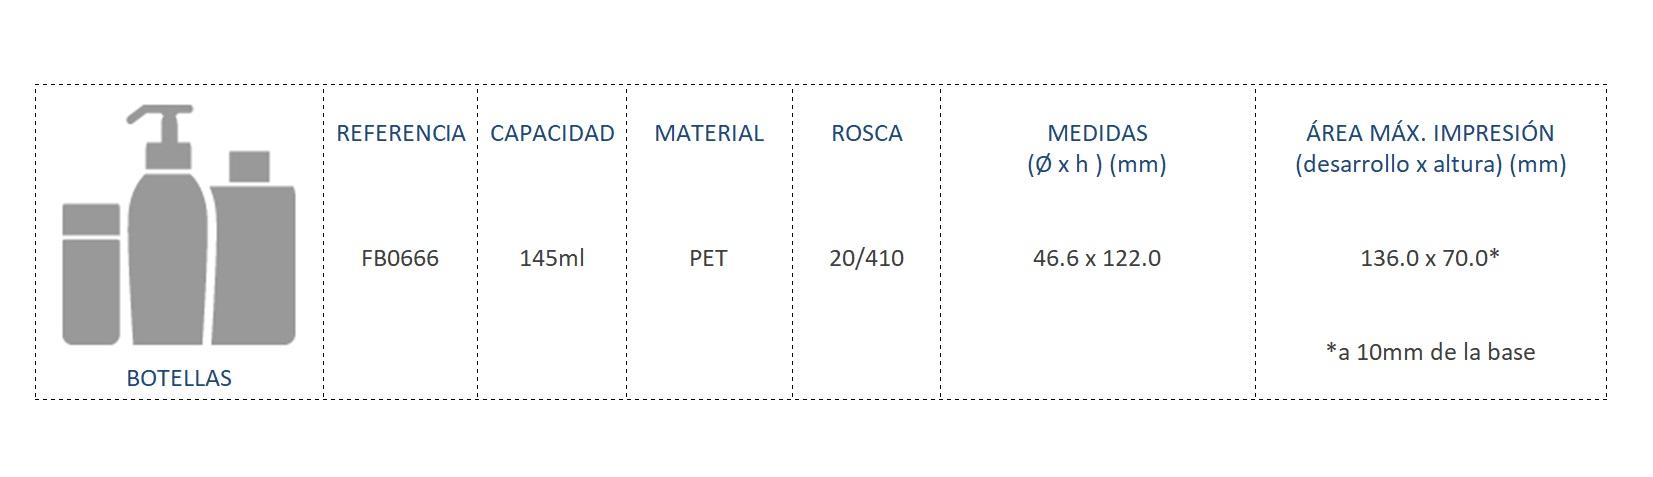 Cuadro de materiales botella FB0666